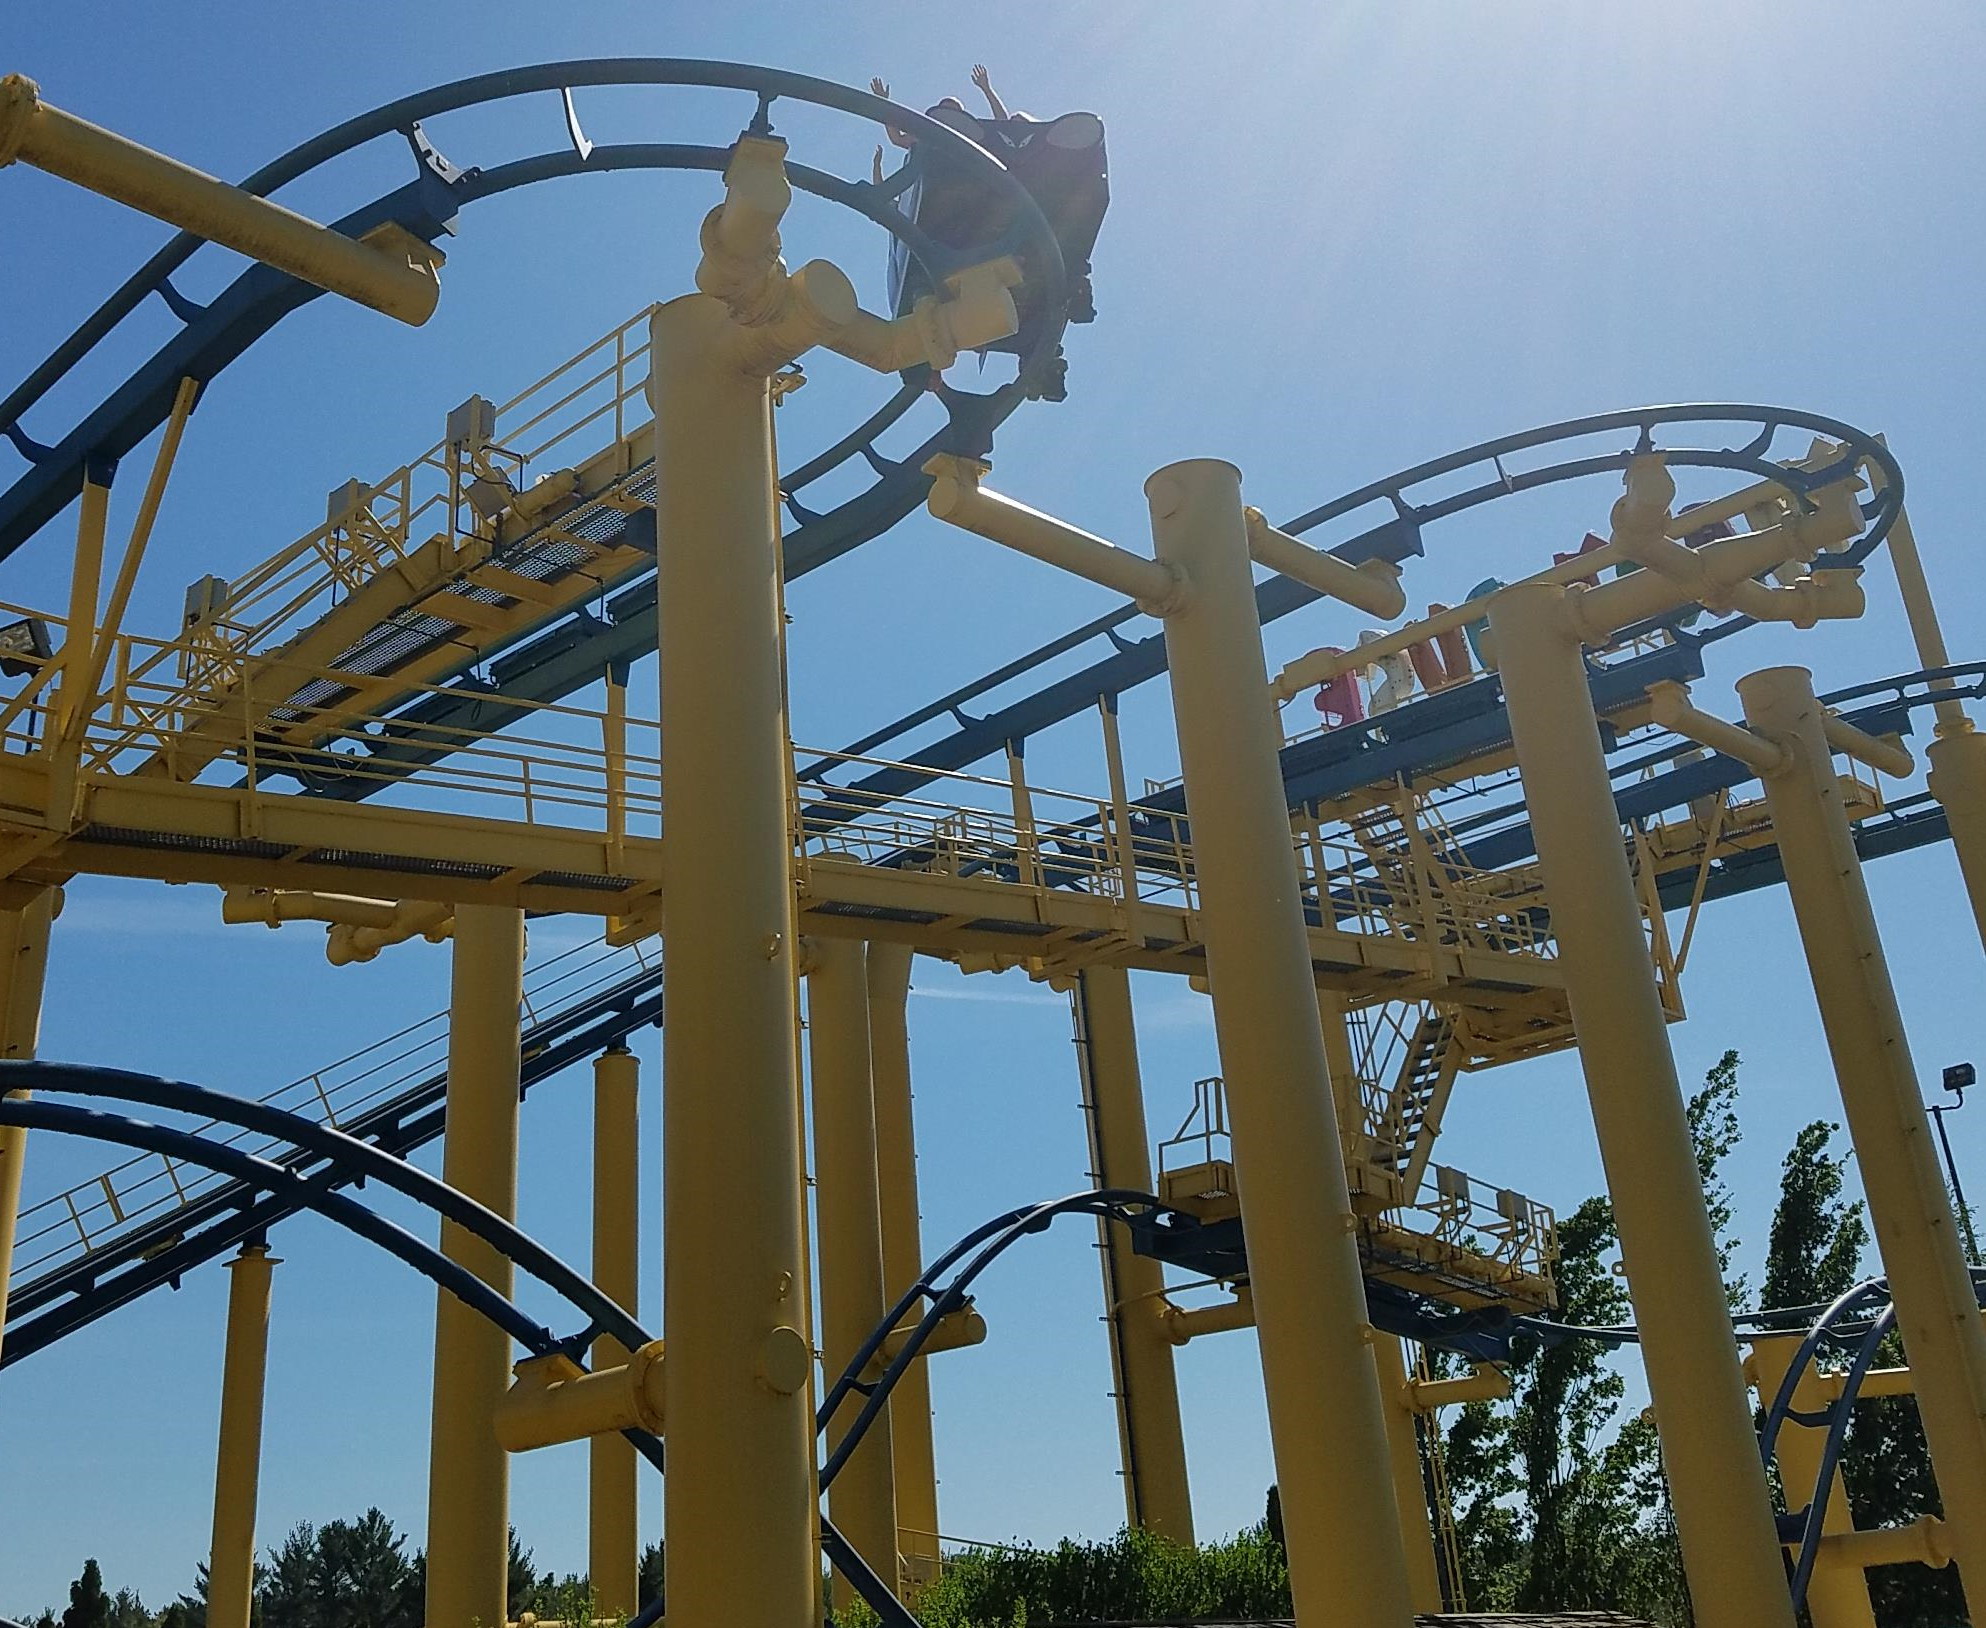 Michigan's Best Amusement Park - Michigan's Adventure